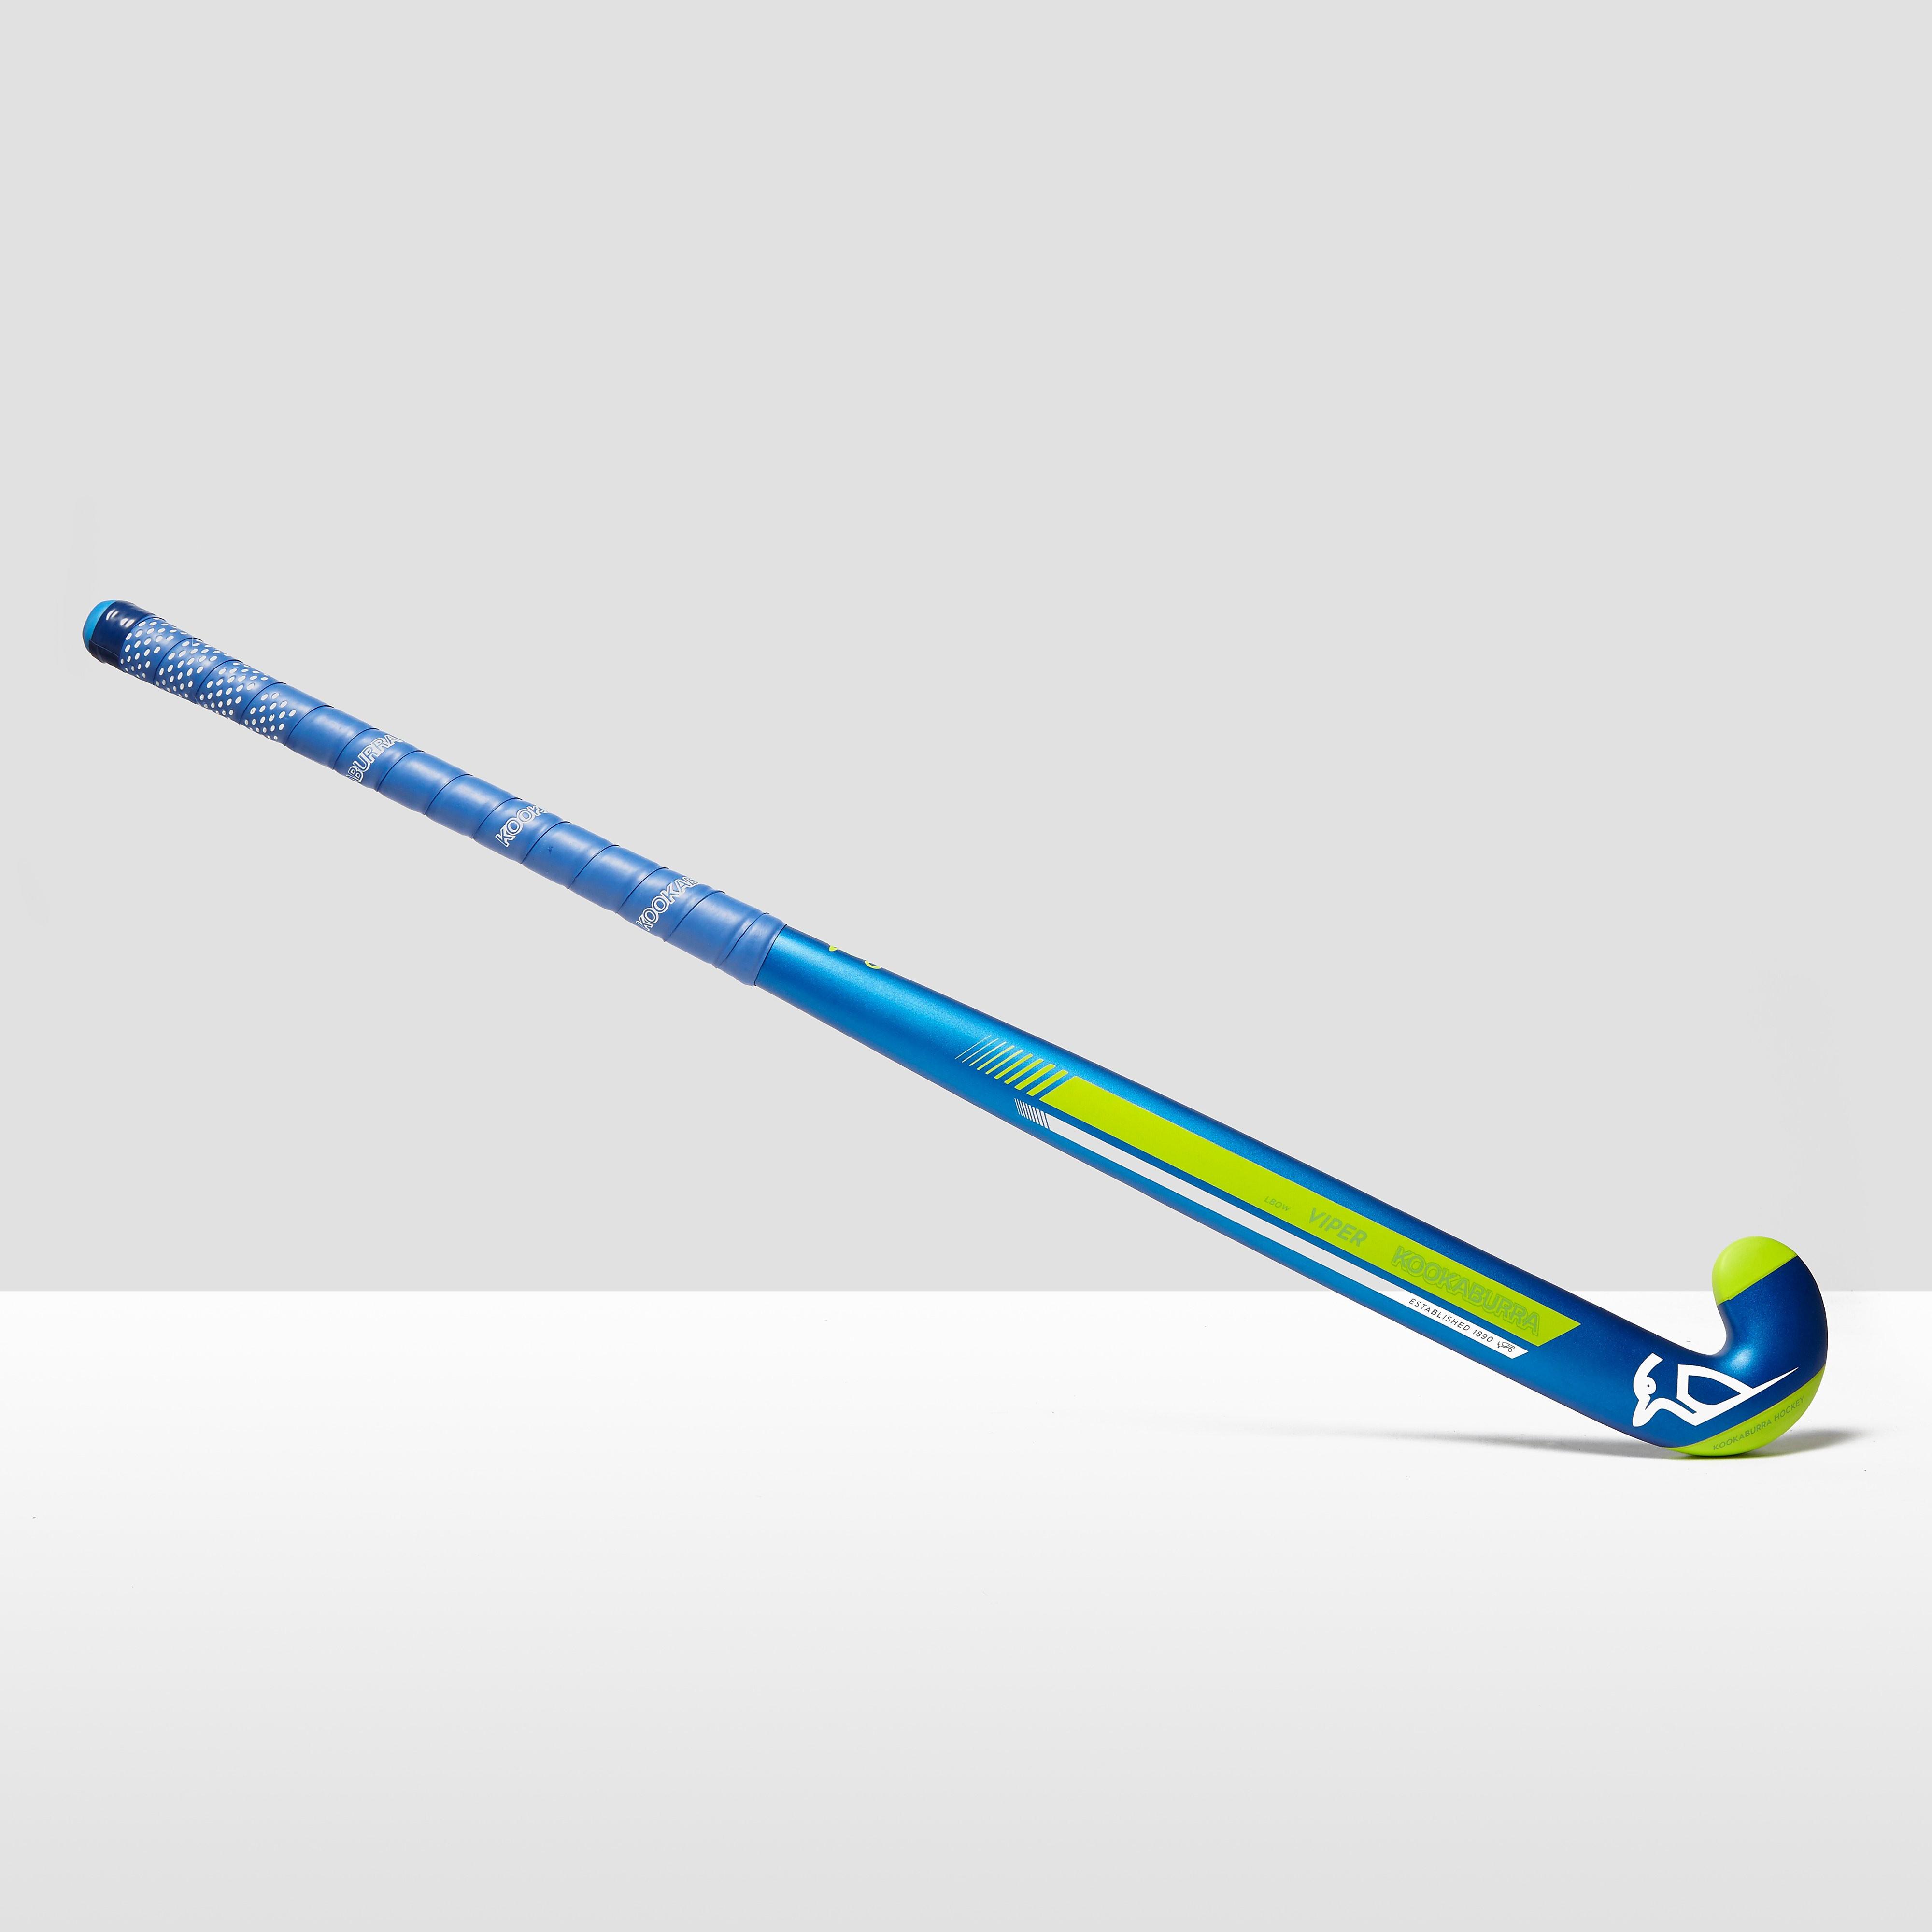 Kookaburra Viper Hockey Stick